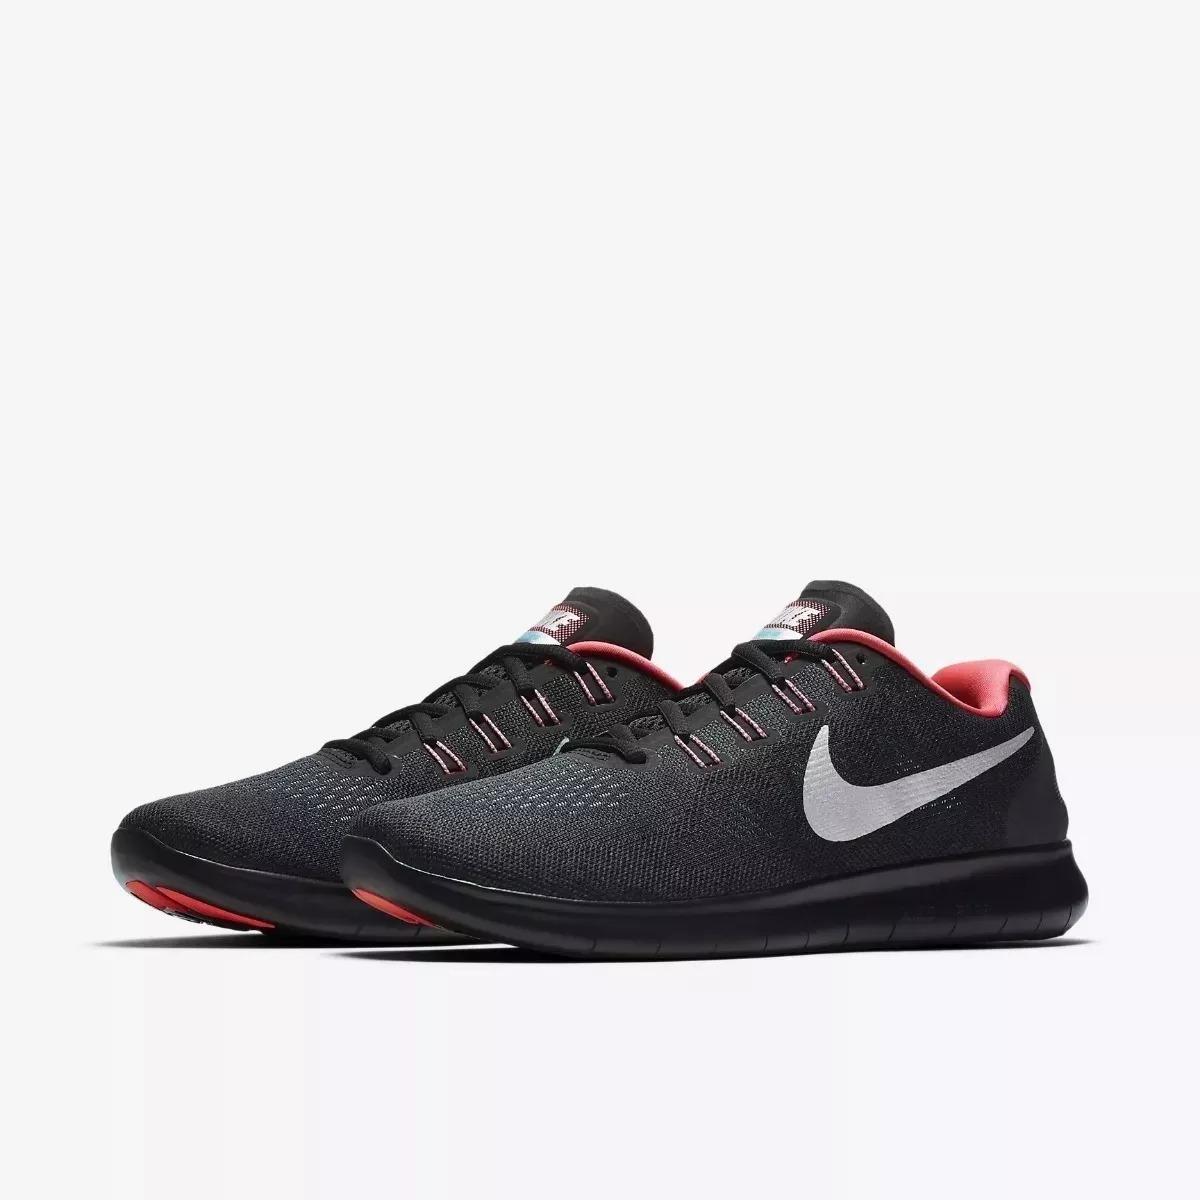 19e0efe525032 zapatillas nike free rn 2017 oferta mujer negro running. Cargando zoom.